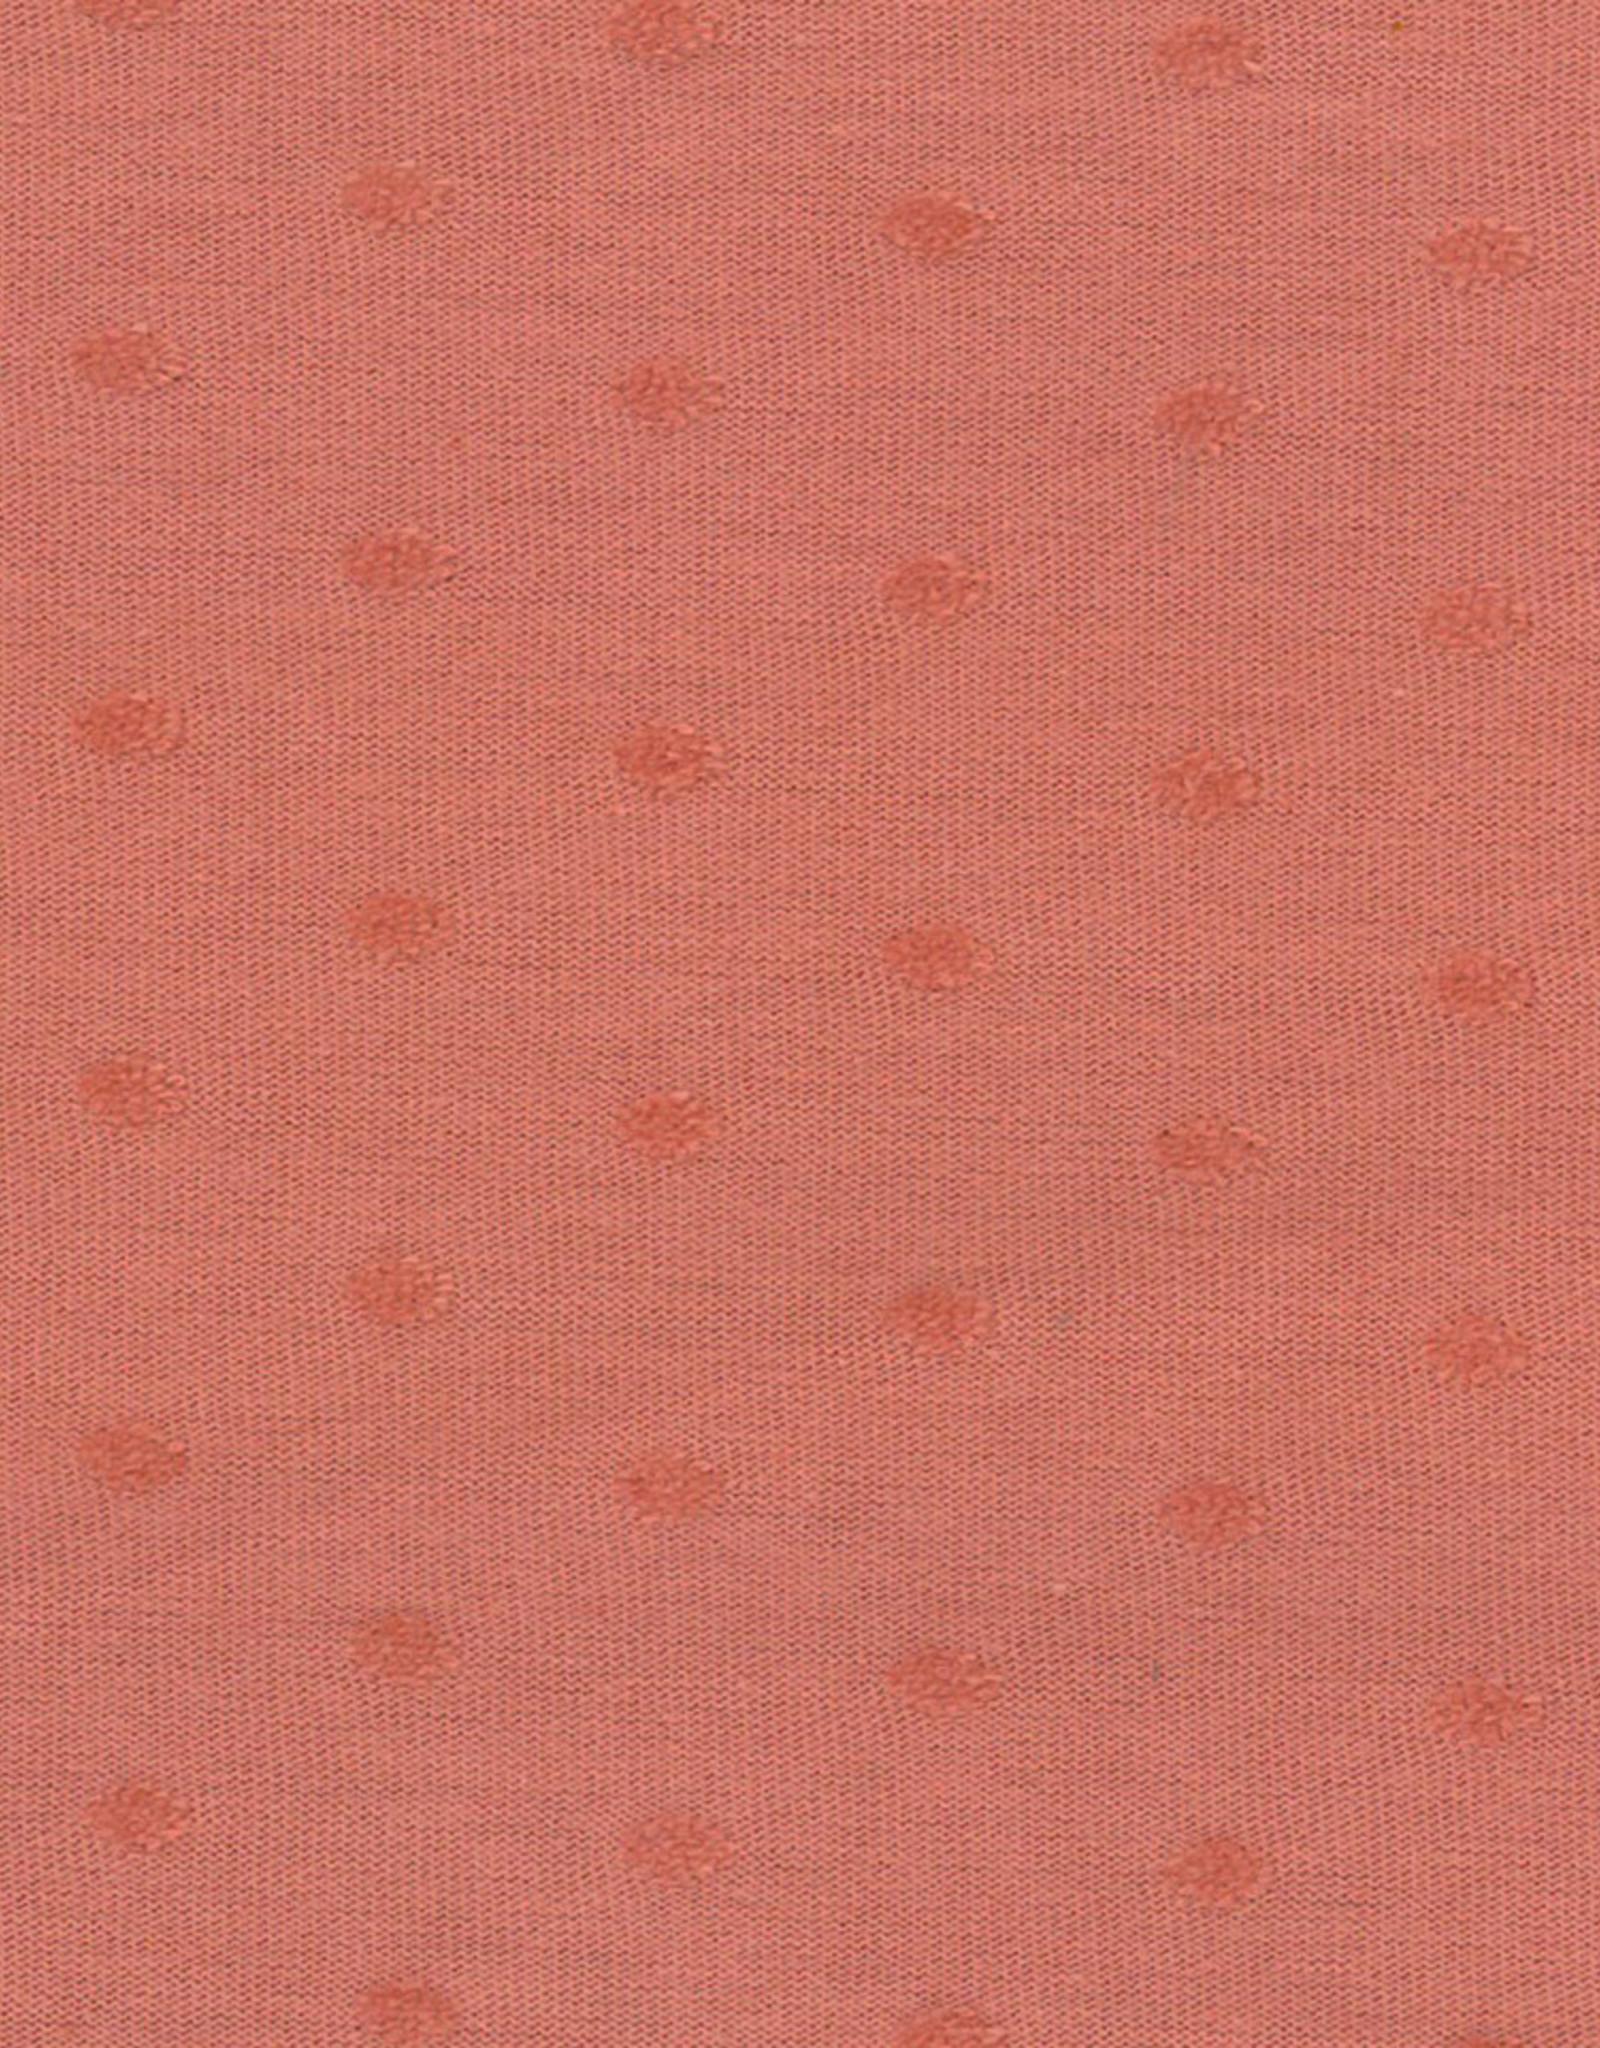 Domotex COUPON Jersey dots marsala 75x150cm